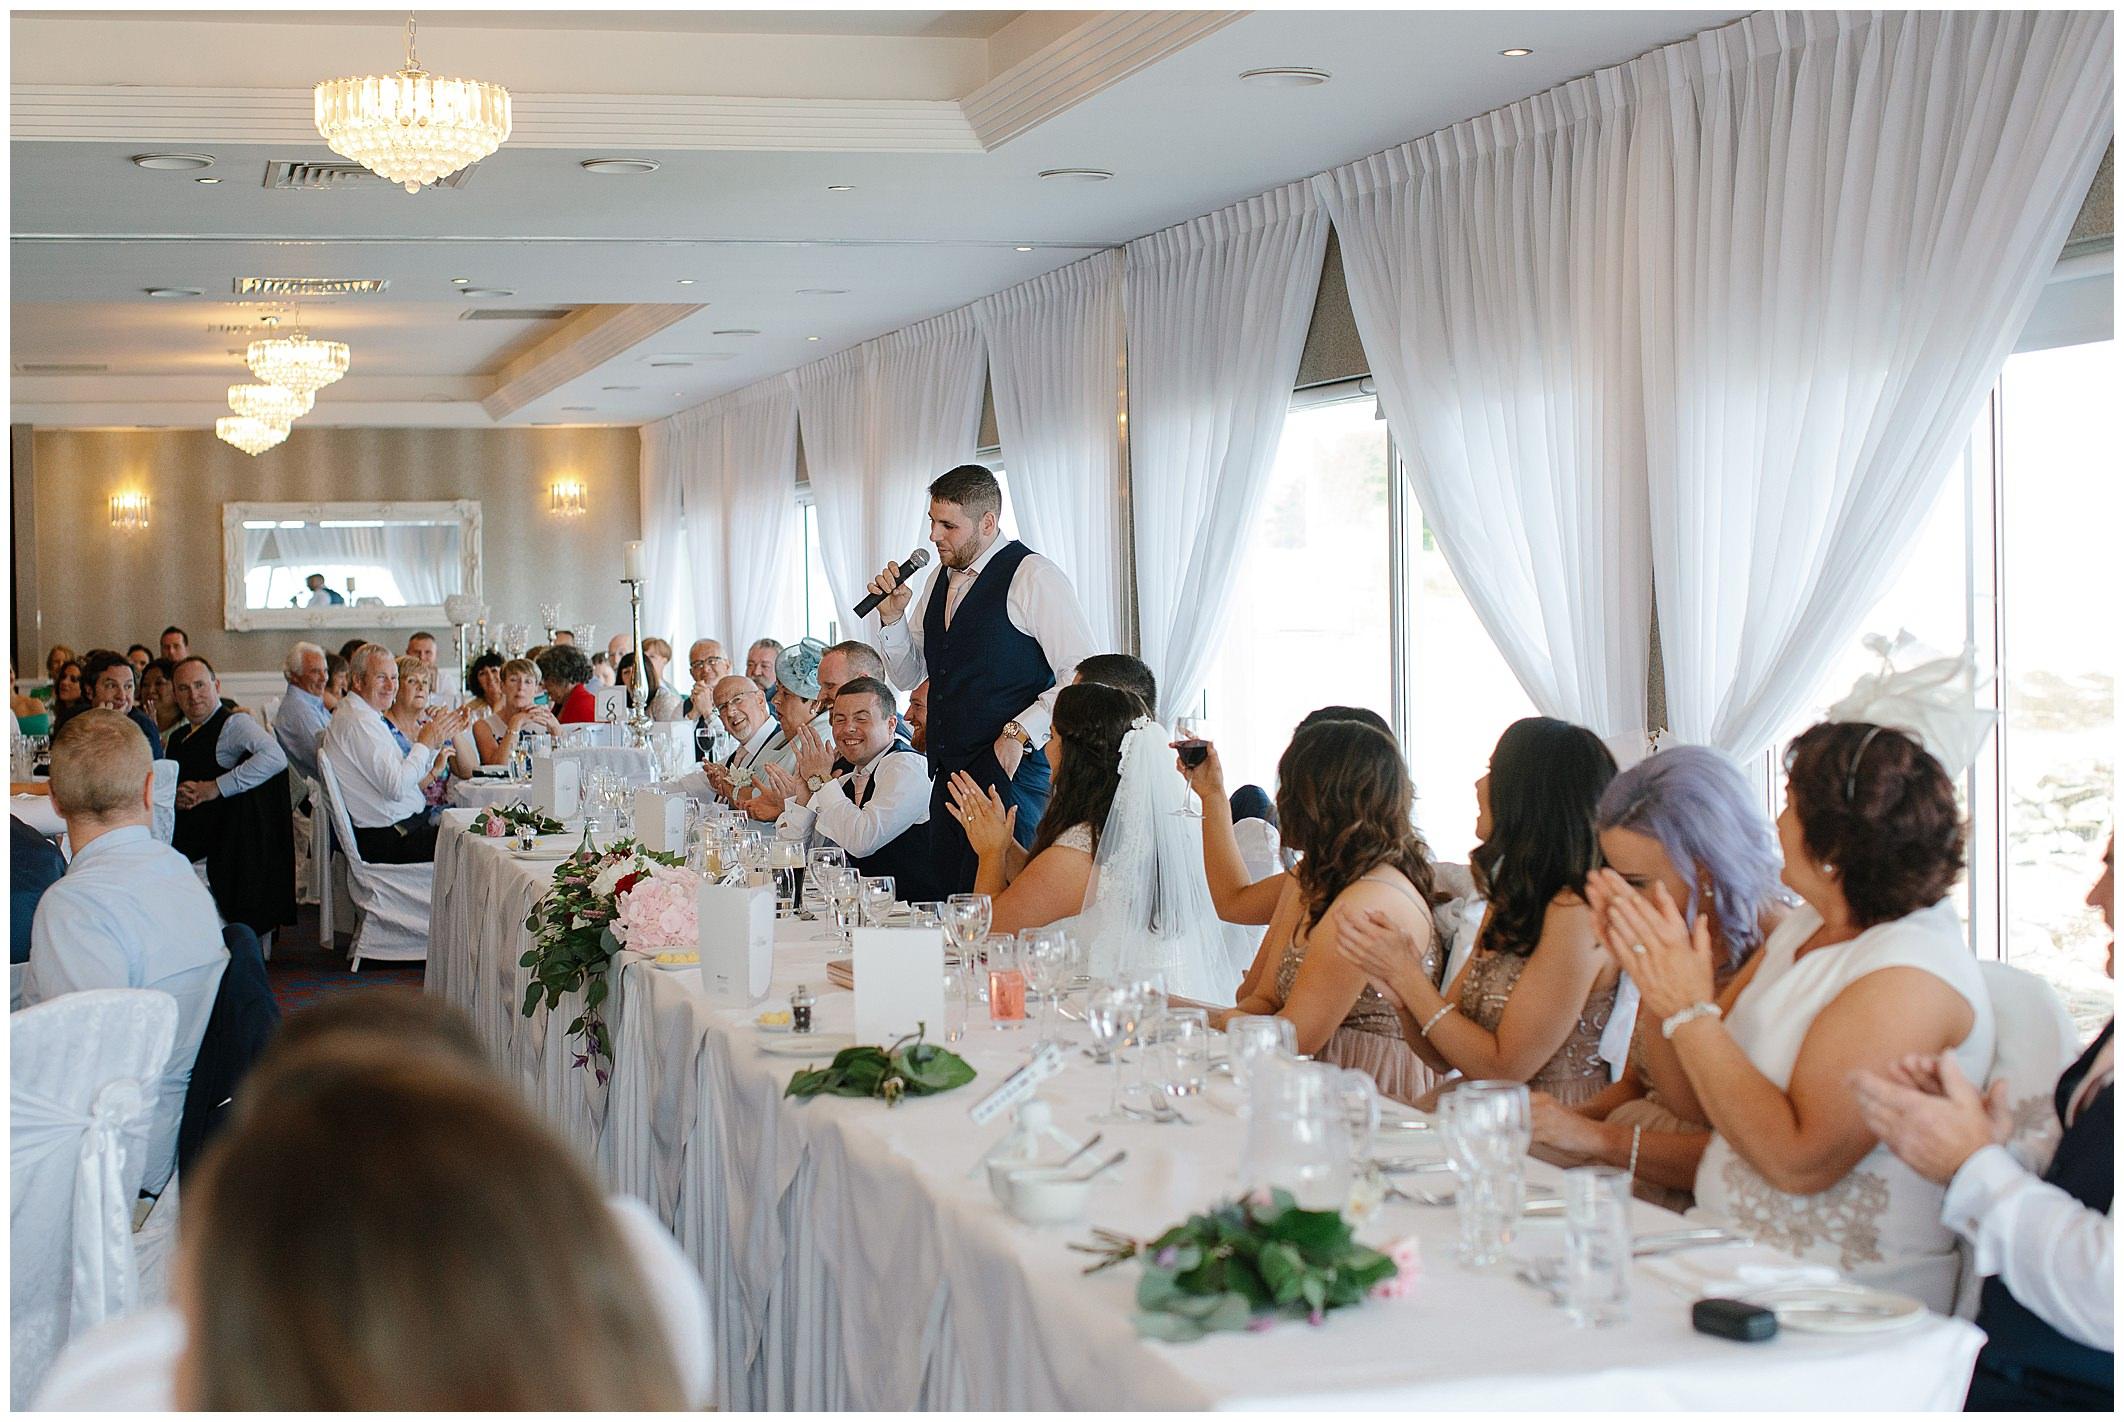 redcastle-hotel-wedding-karen-brian-jude-browne-photography-125.jpg